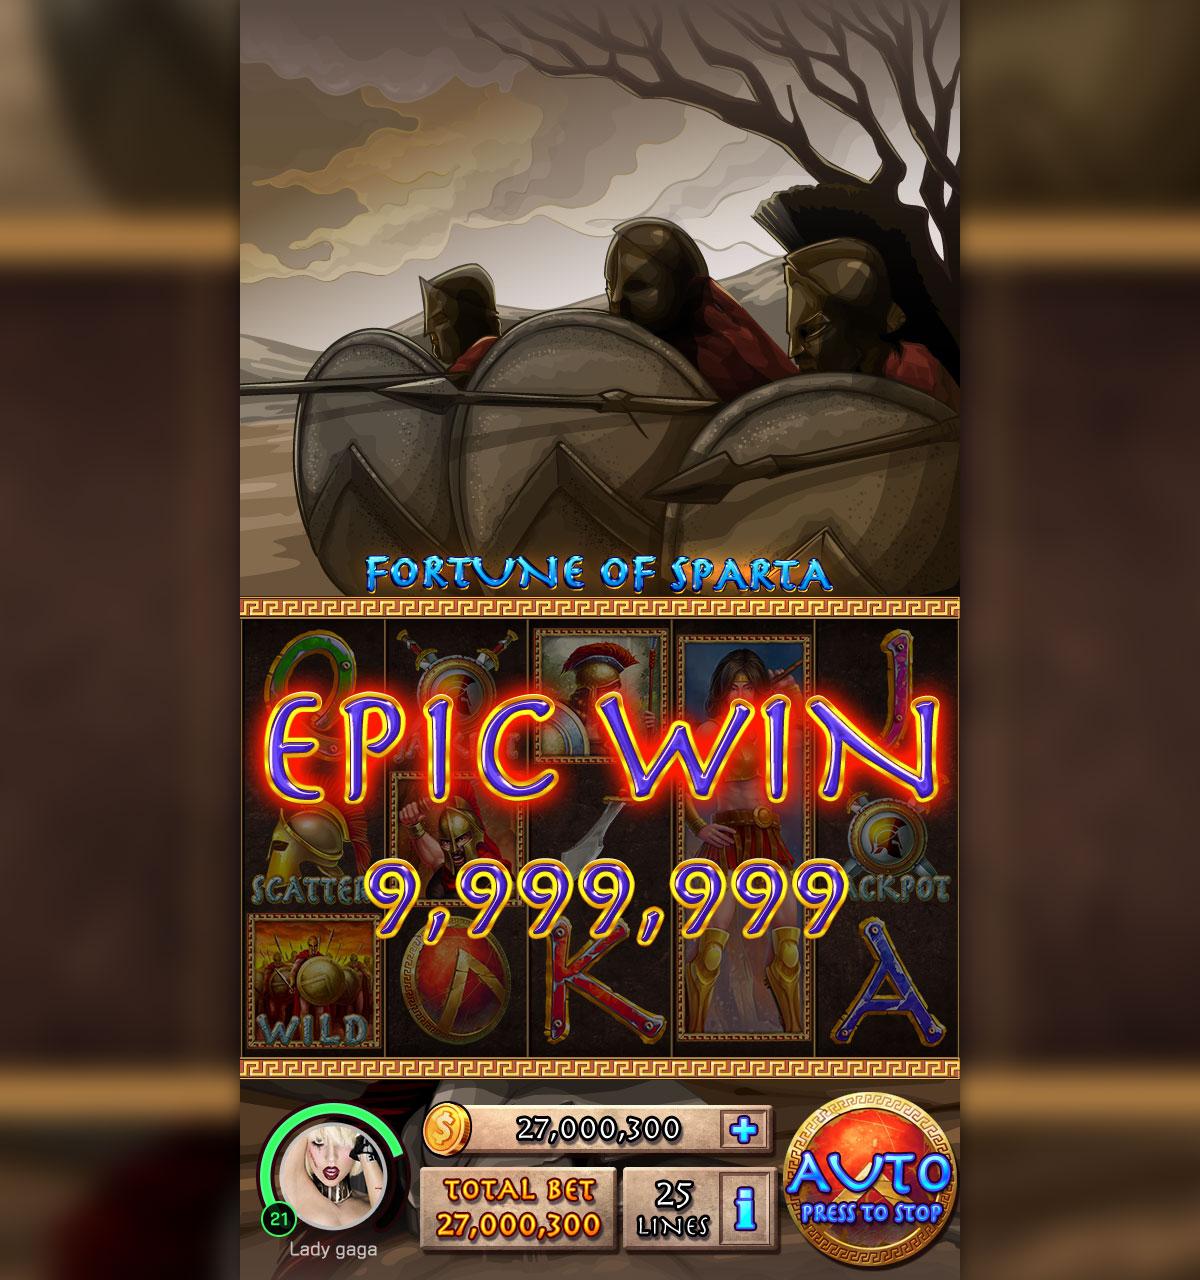 fortune_of_sparta_blog_epicwin